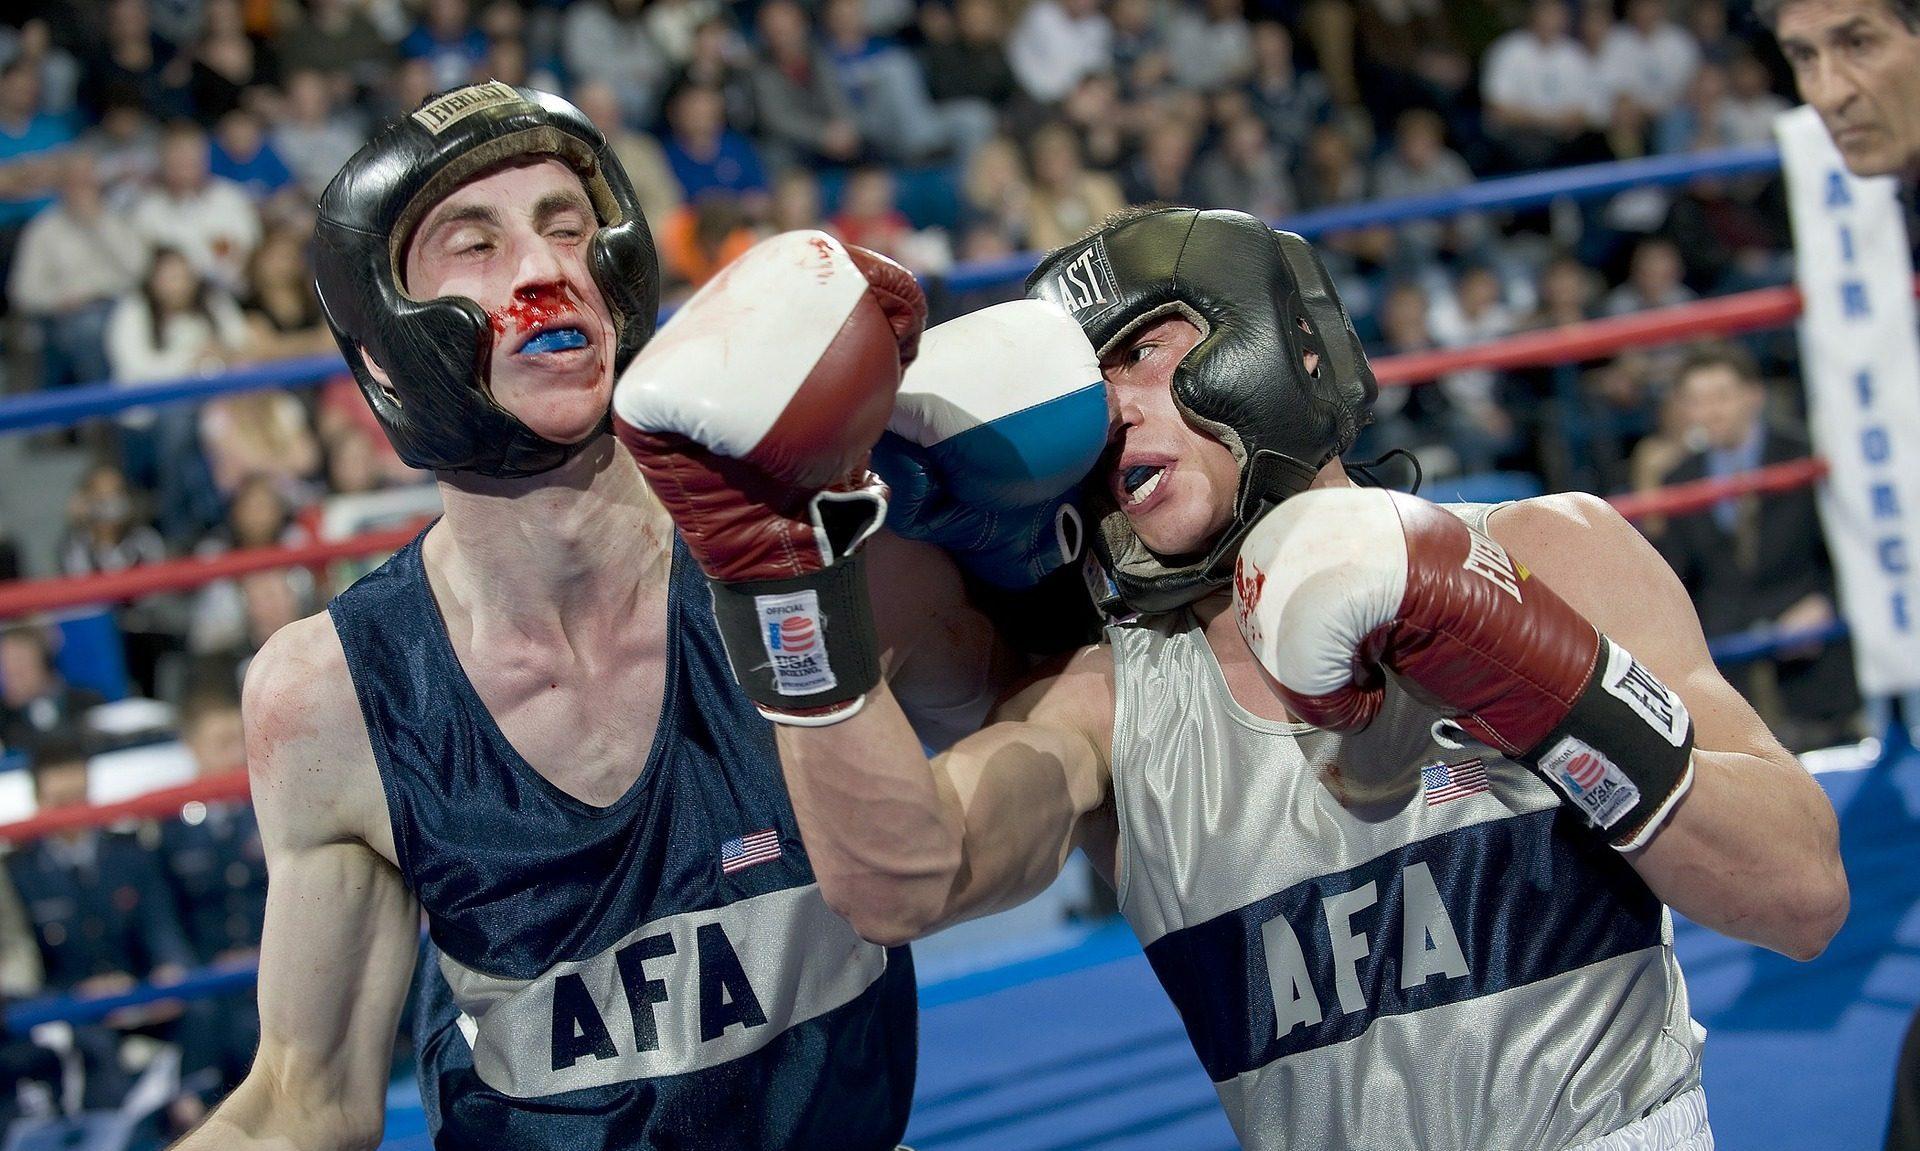 Rodriguez Boxing Club